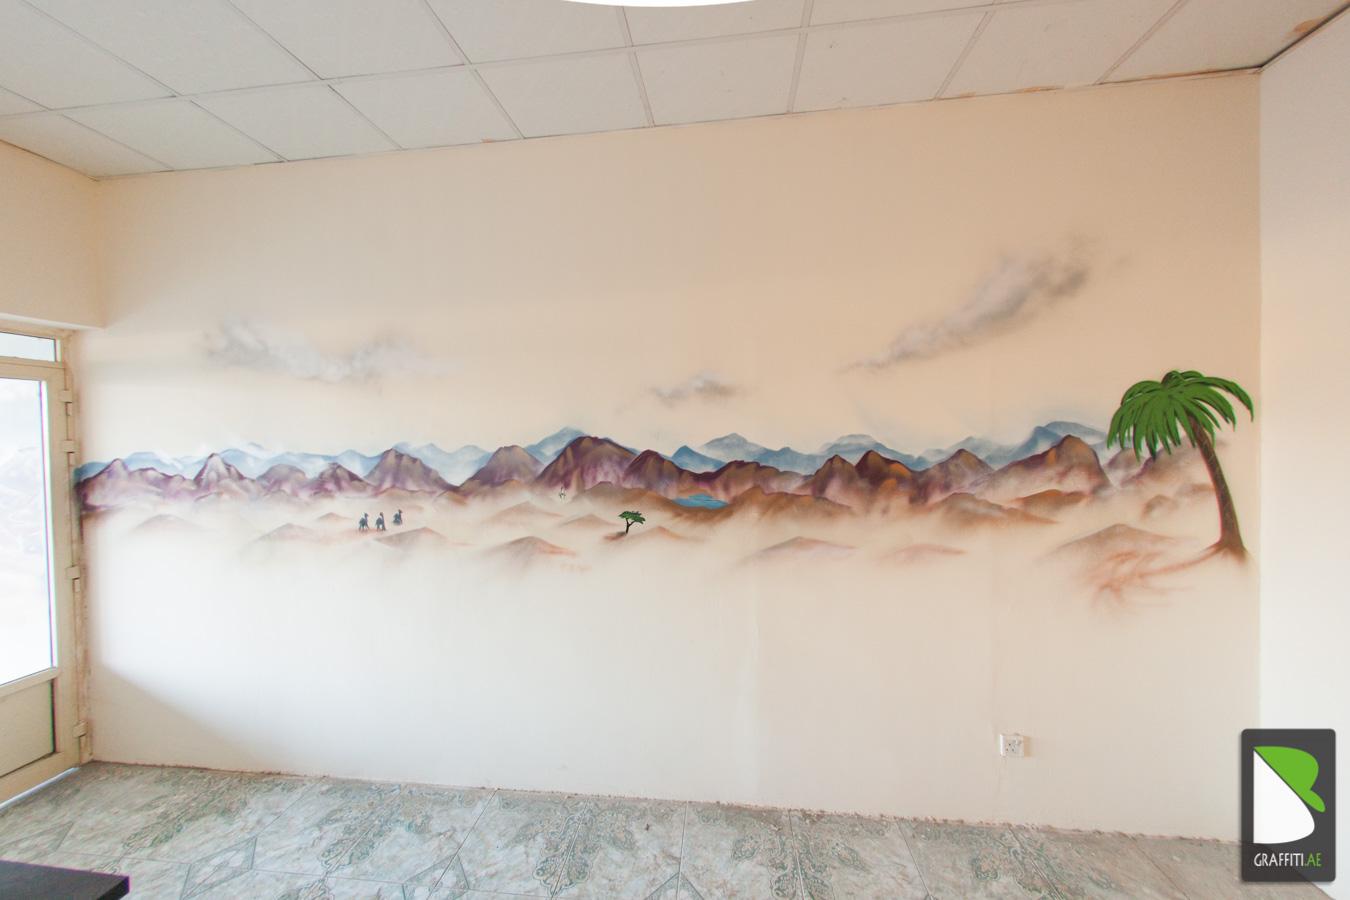 Graffiti wall uae - Uae Graffiti Artist Bike Shawka 3